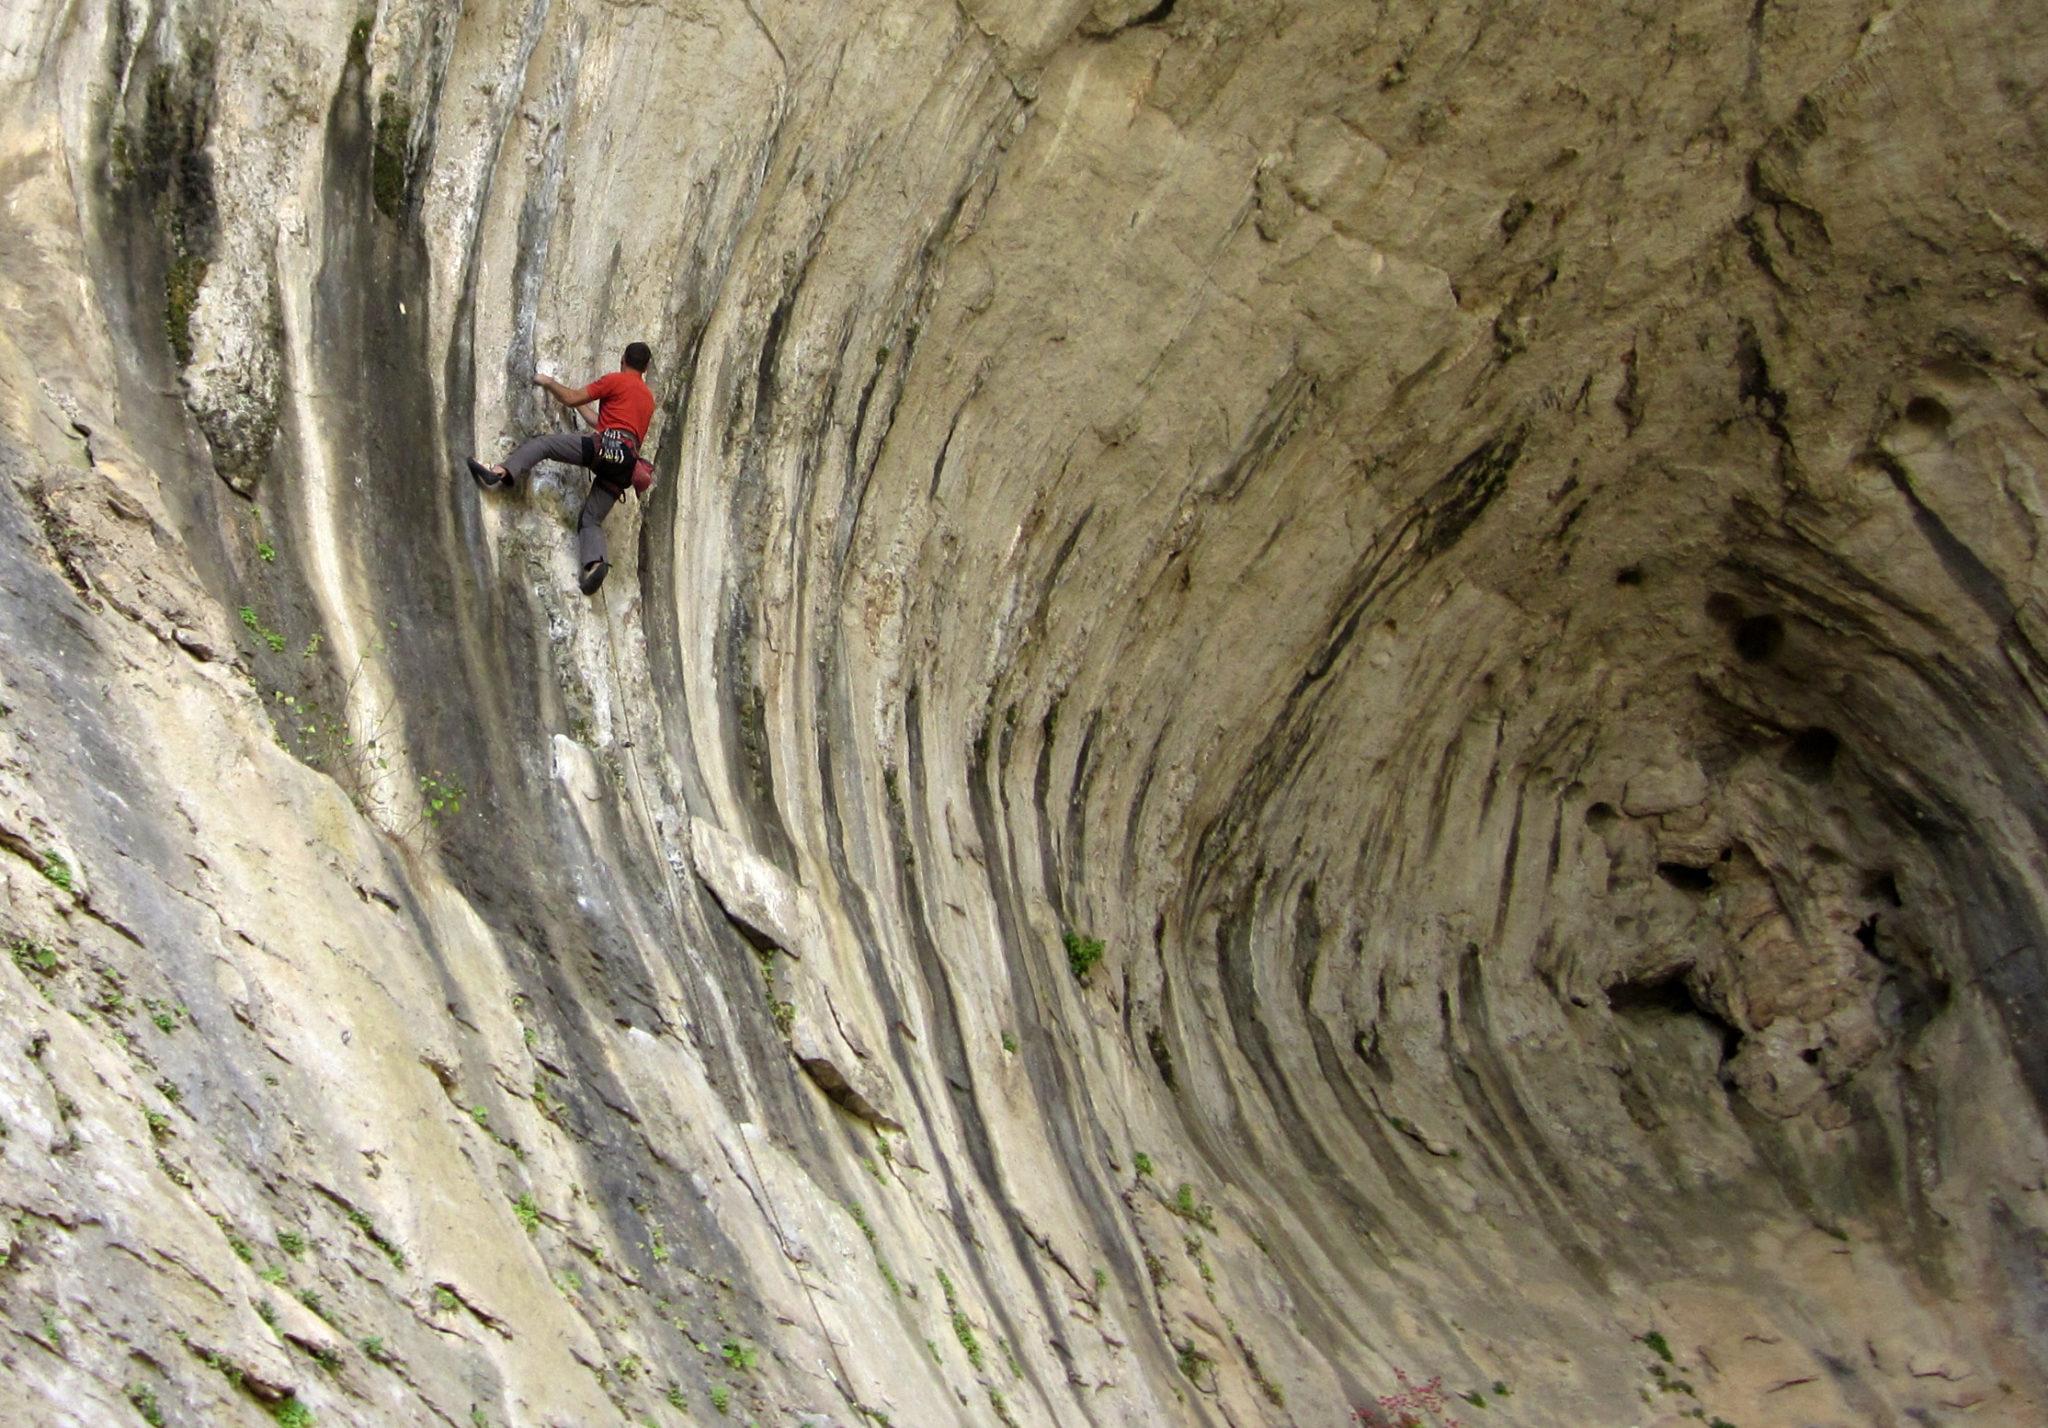 Rock Climbing Explore Bulgaria @ Veliko Tarnovo